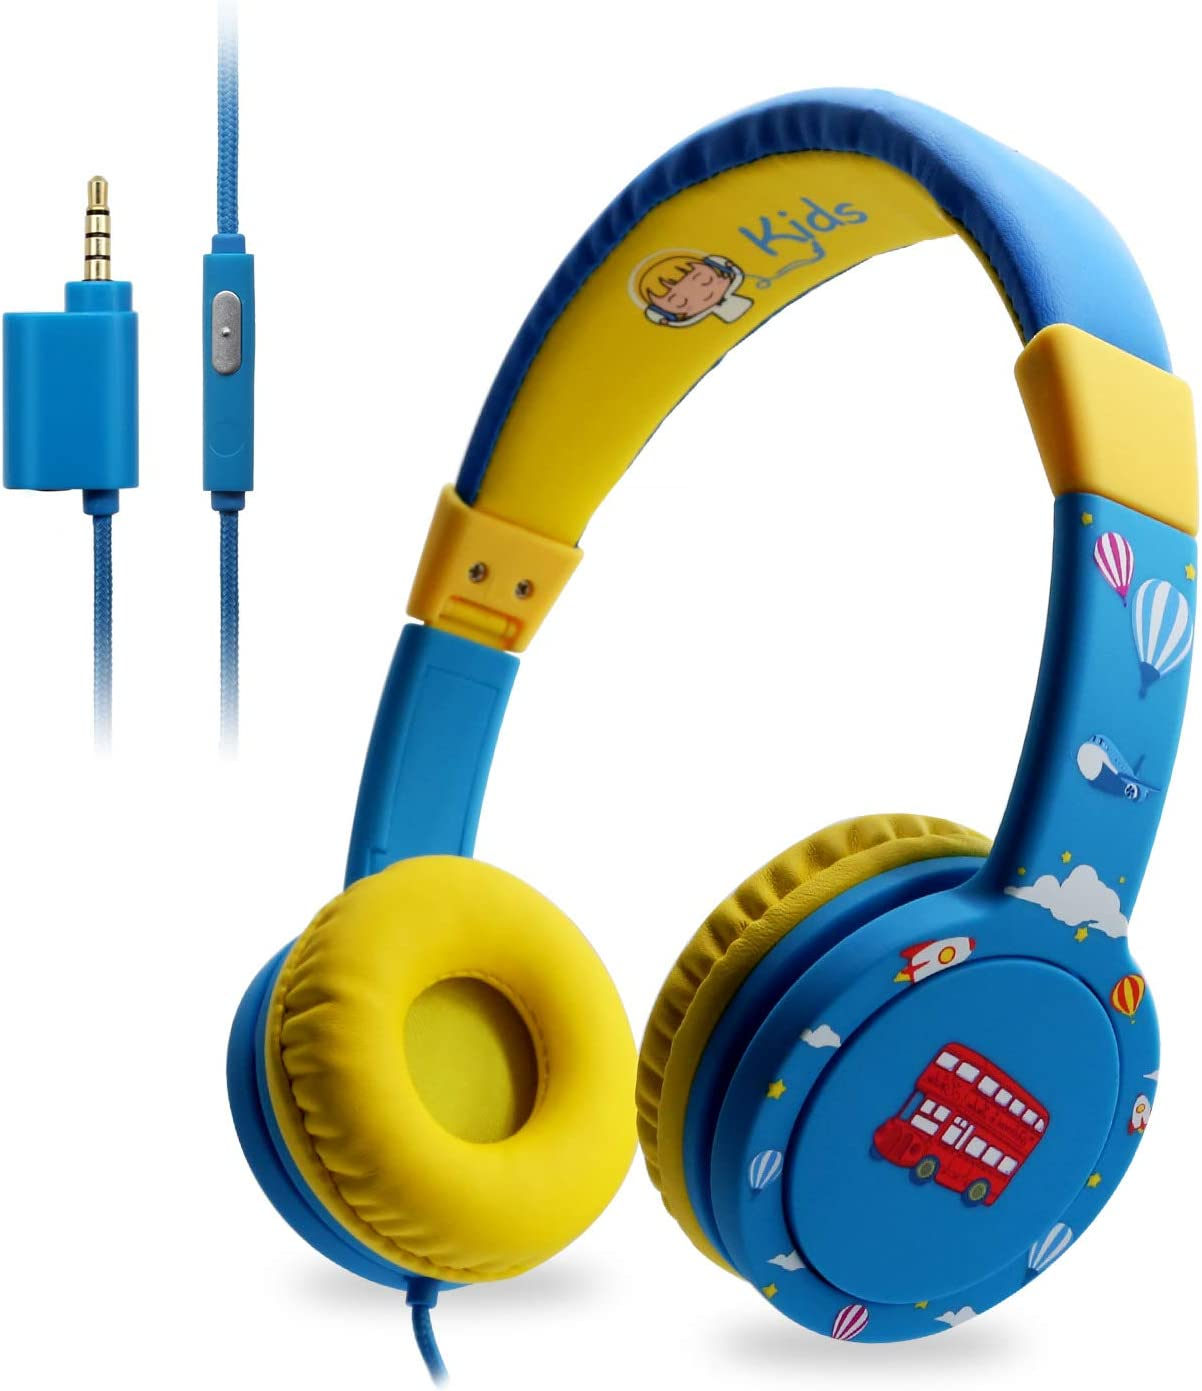 EasySMX Leicht-Kopfh/örer verstellbare Headset f/ür iPod iPad iPhone Kinderkopfh/örer mit Laust/ärkebegrenzung Handy Tablet PC MP3 MP4 3.5mm